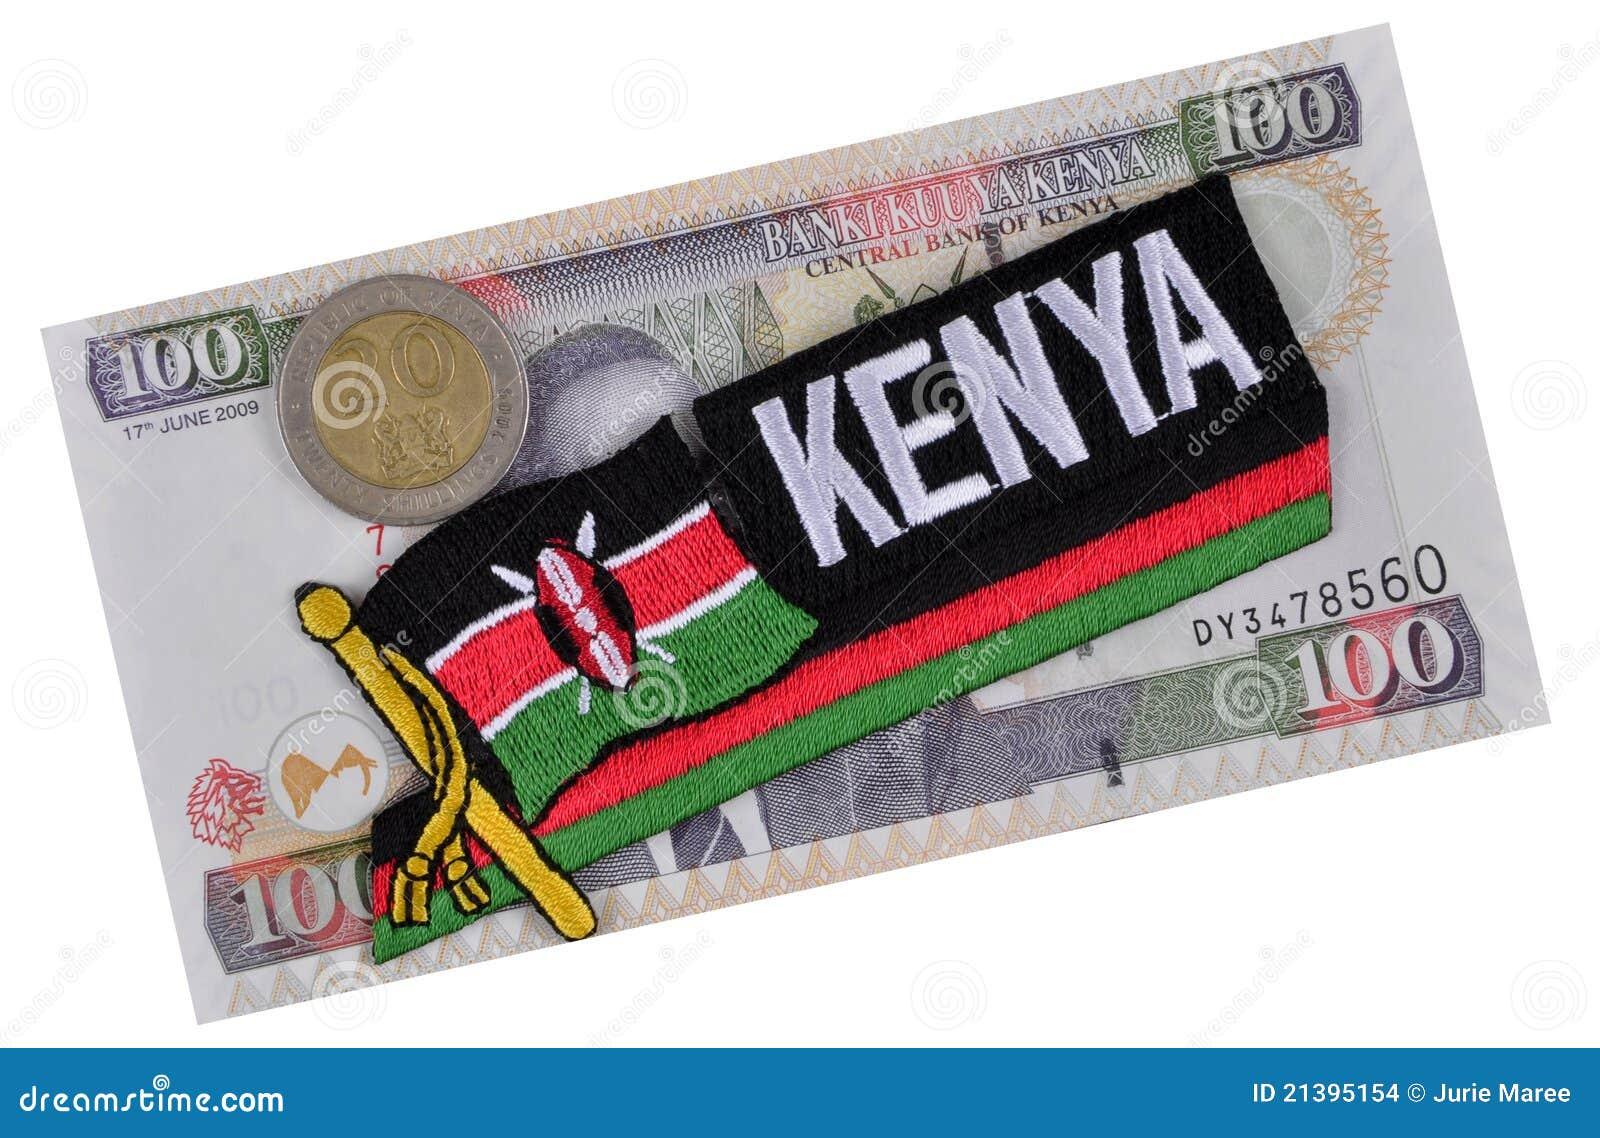 Kenya Shilling. Stock Images